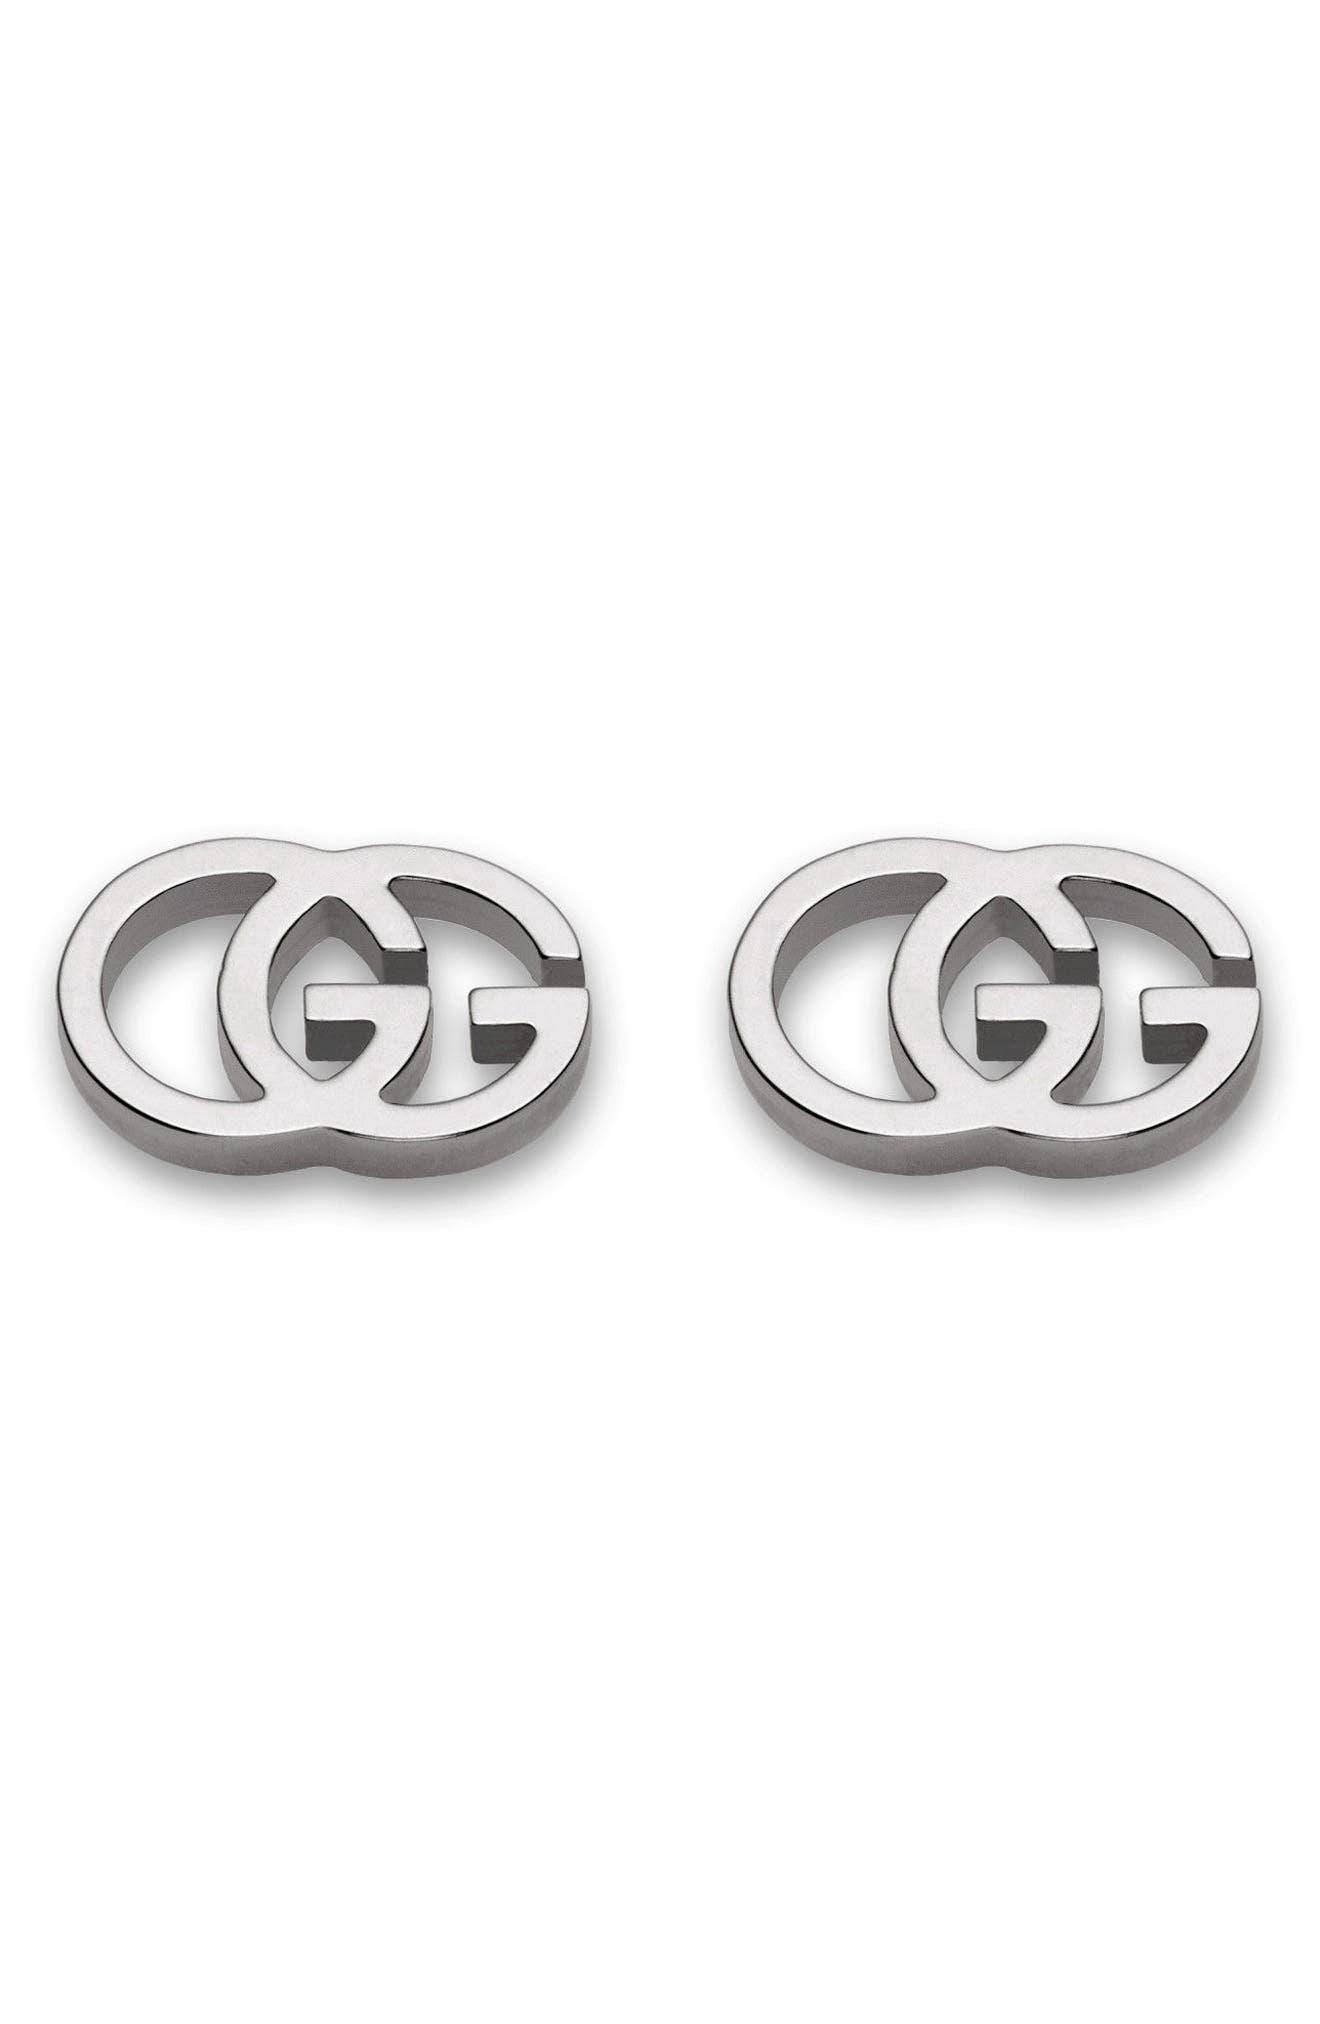 Double-G Stud Earrings,                             Main thumbnail 1, color,                             WHITE GOLD